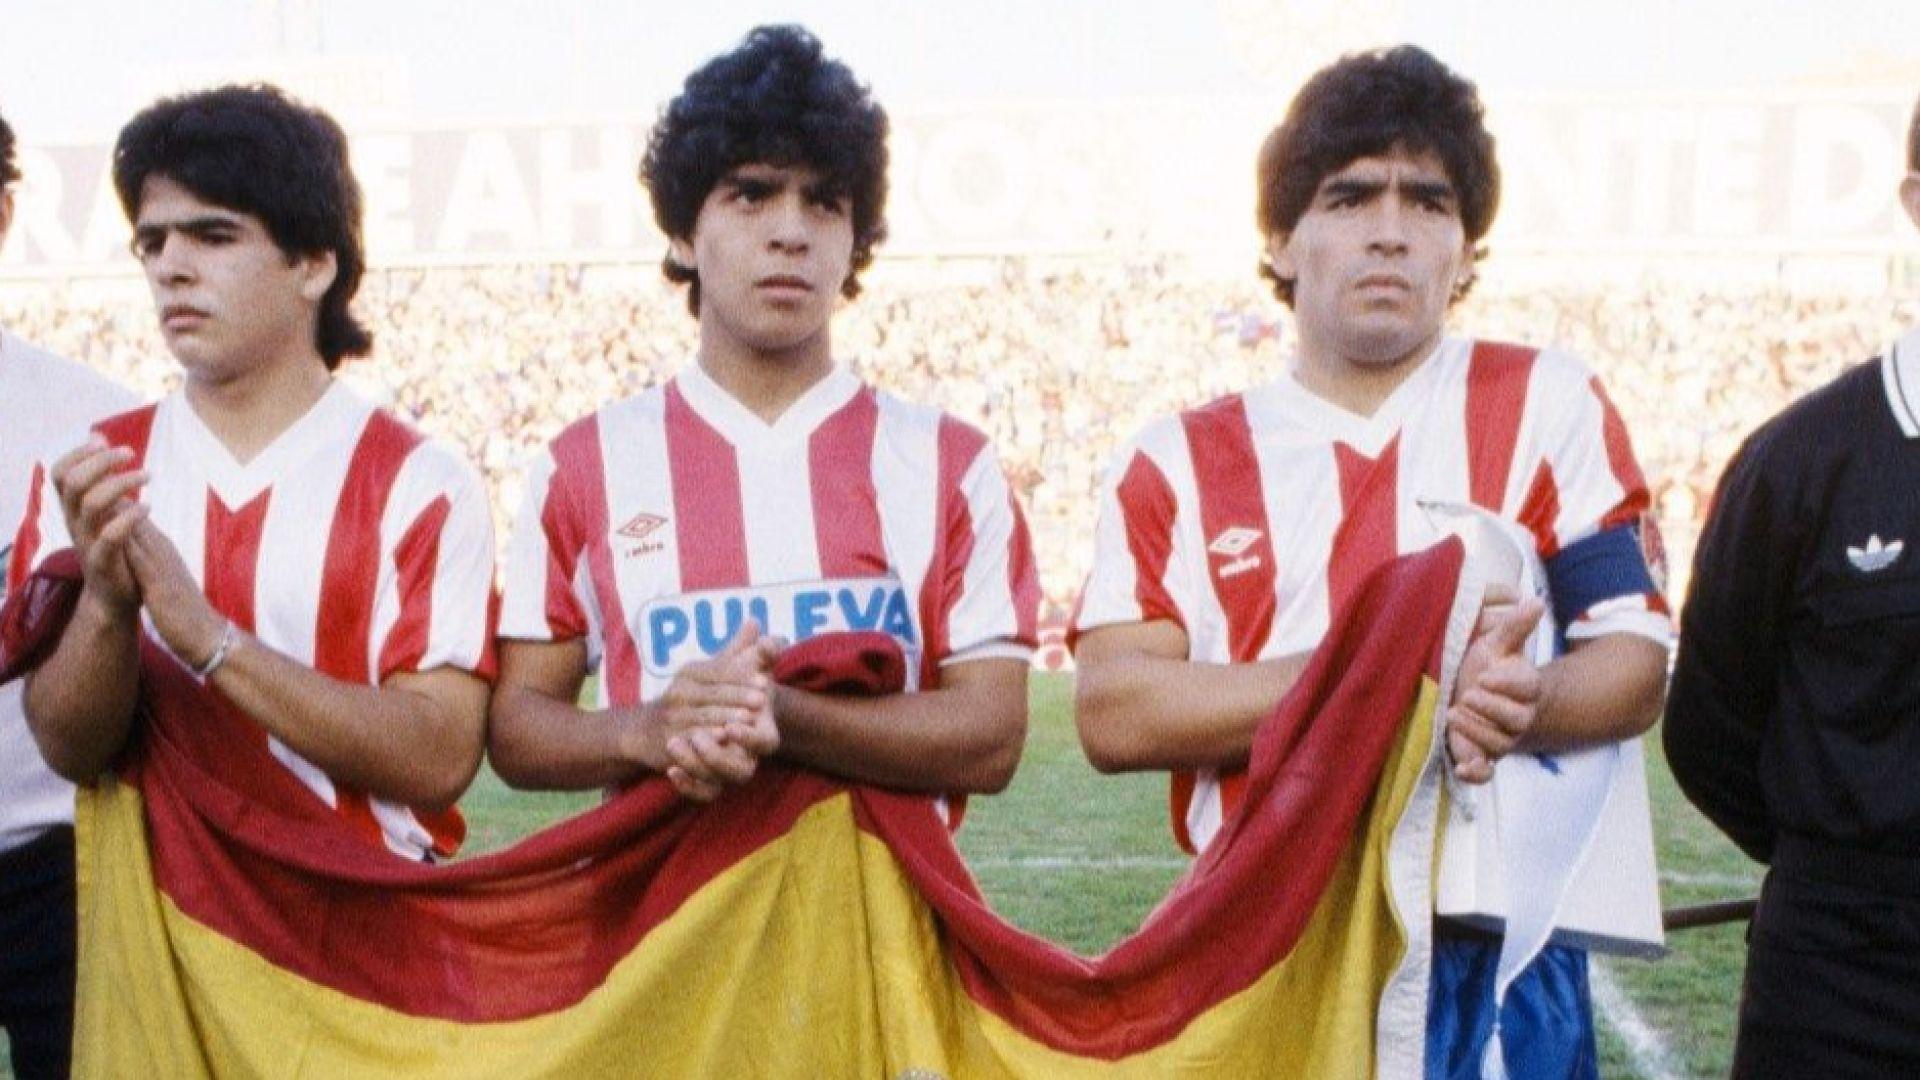 Денят на Тримата Марадона - как Диего и братята му твориха заедно на терена